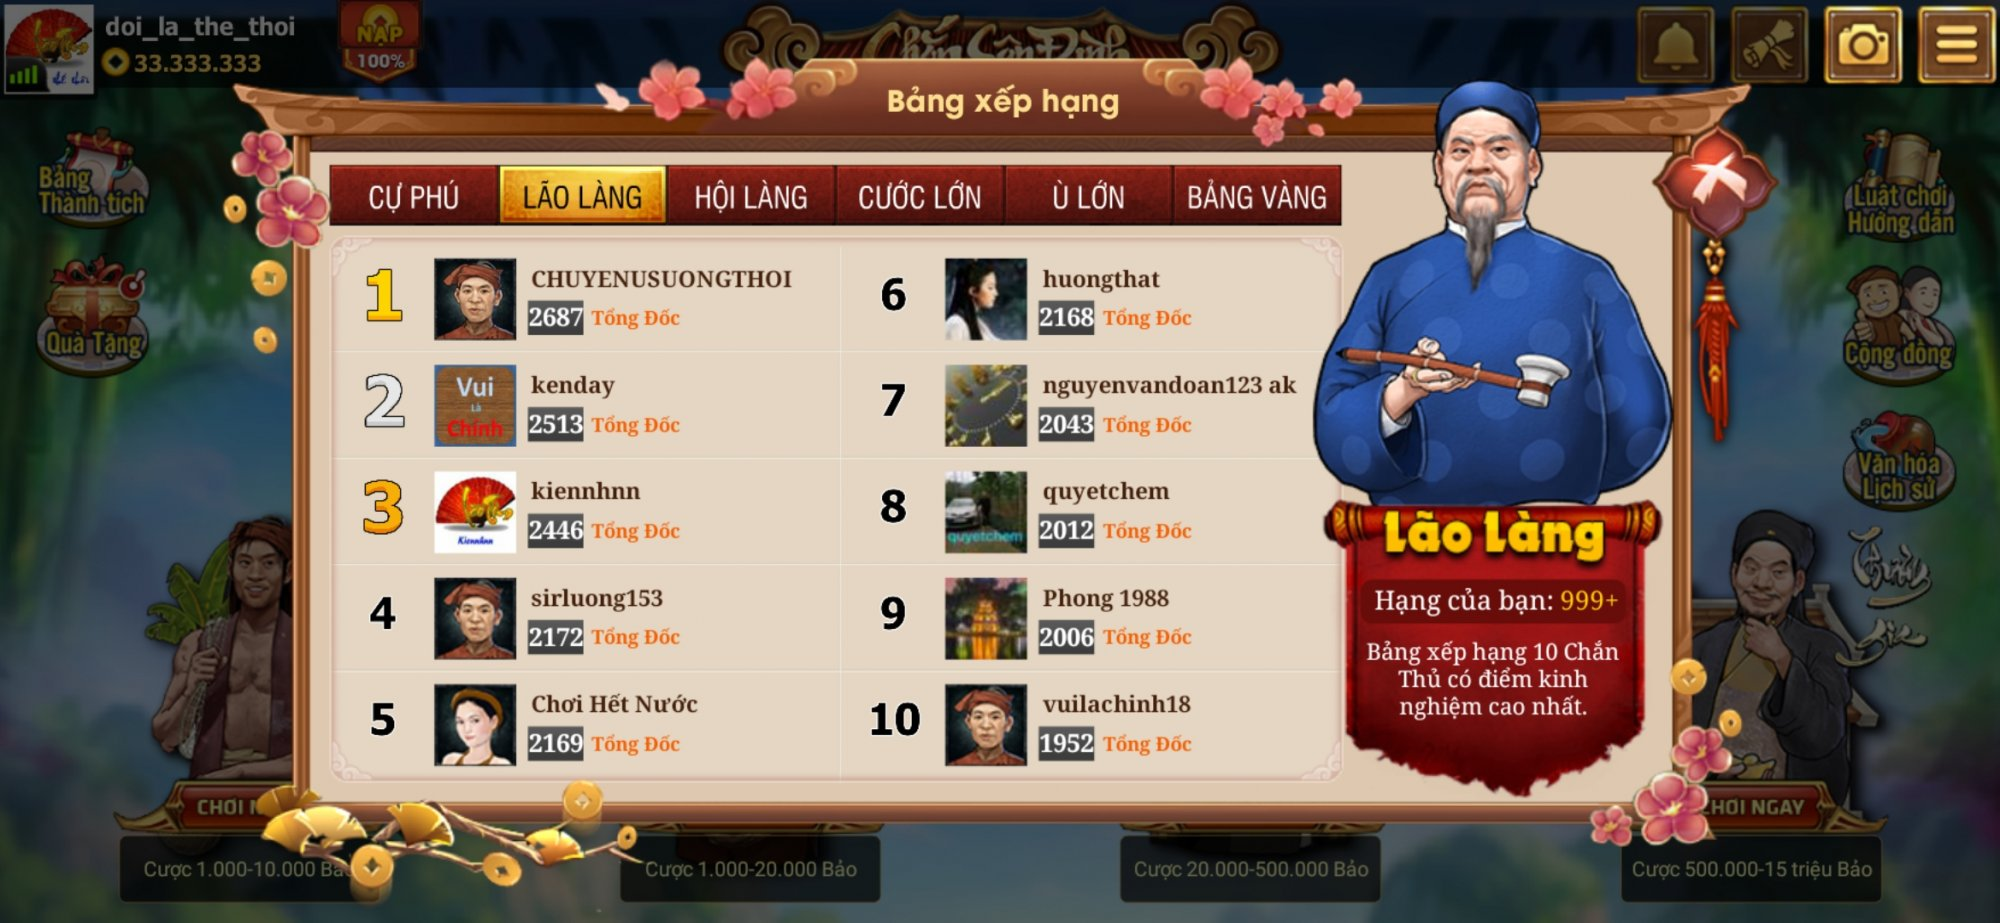 Screenshot_20201008-150725_Chn Sn nh.